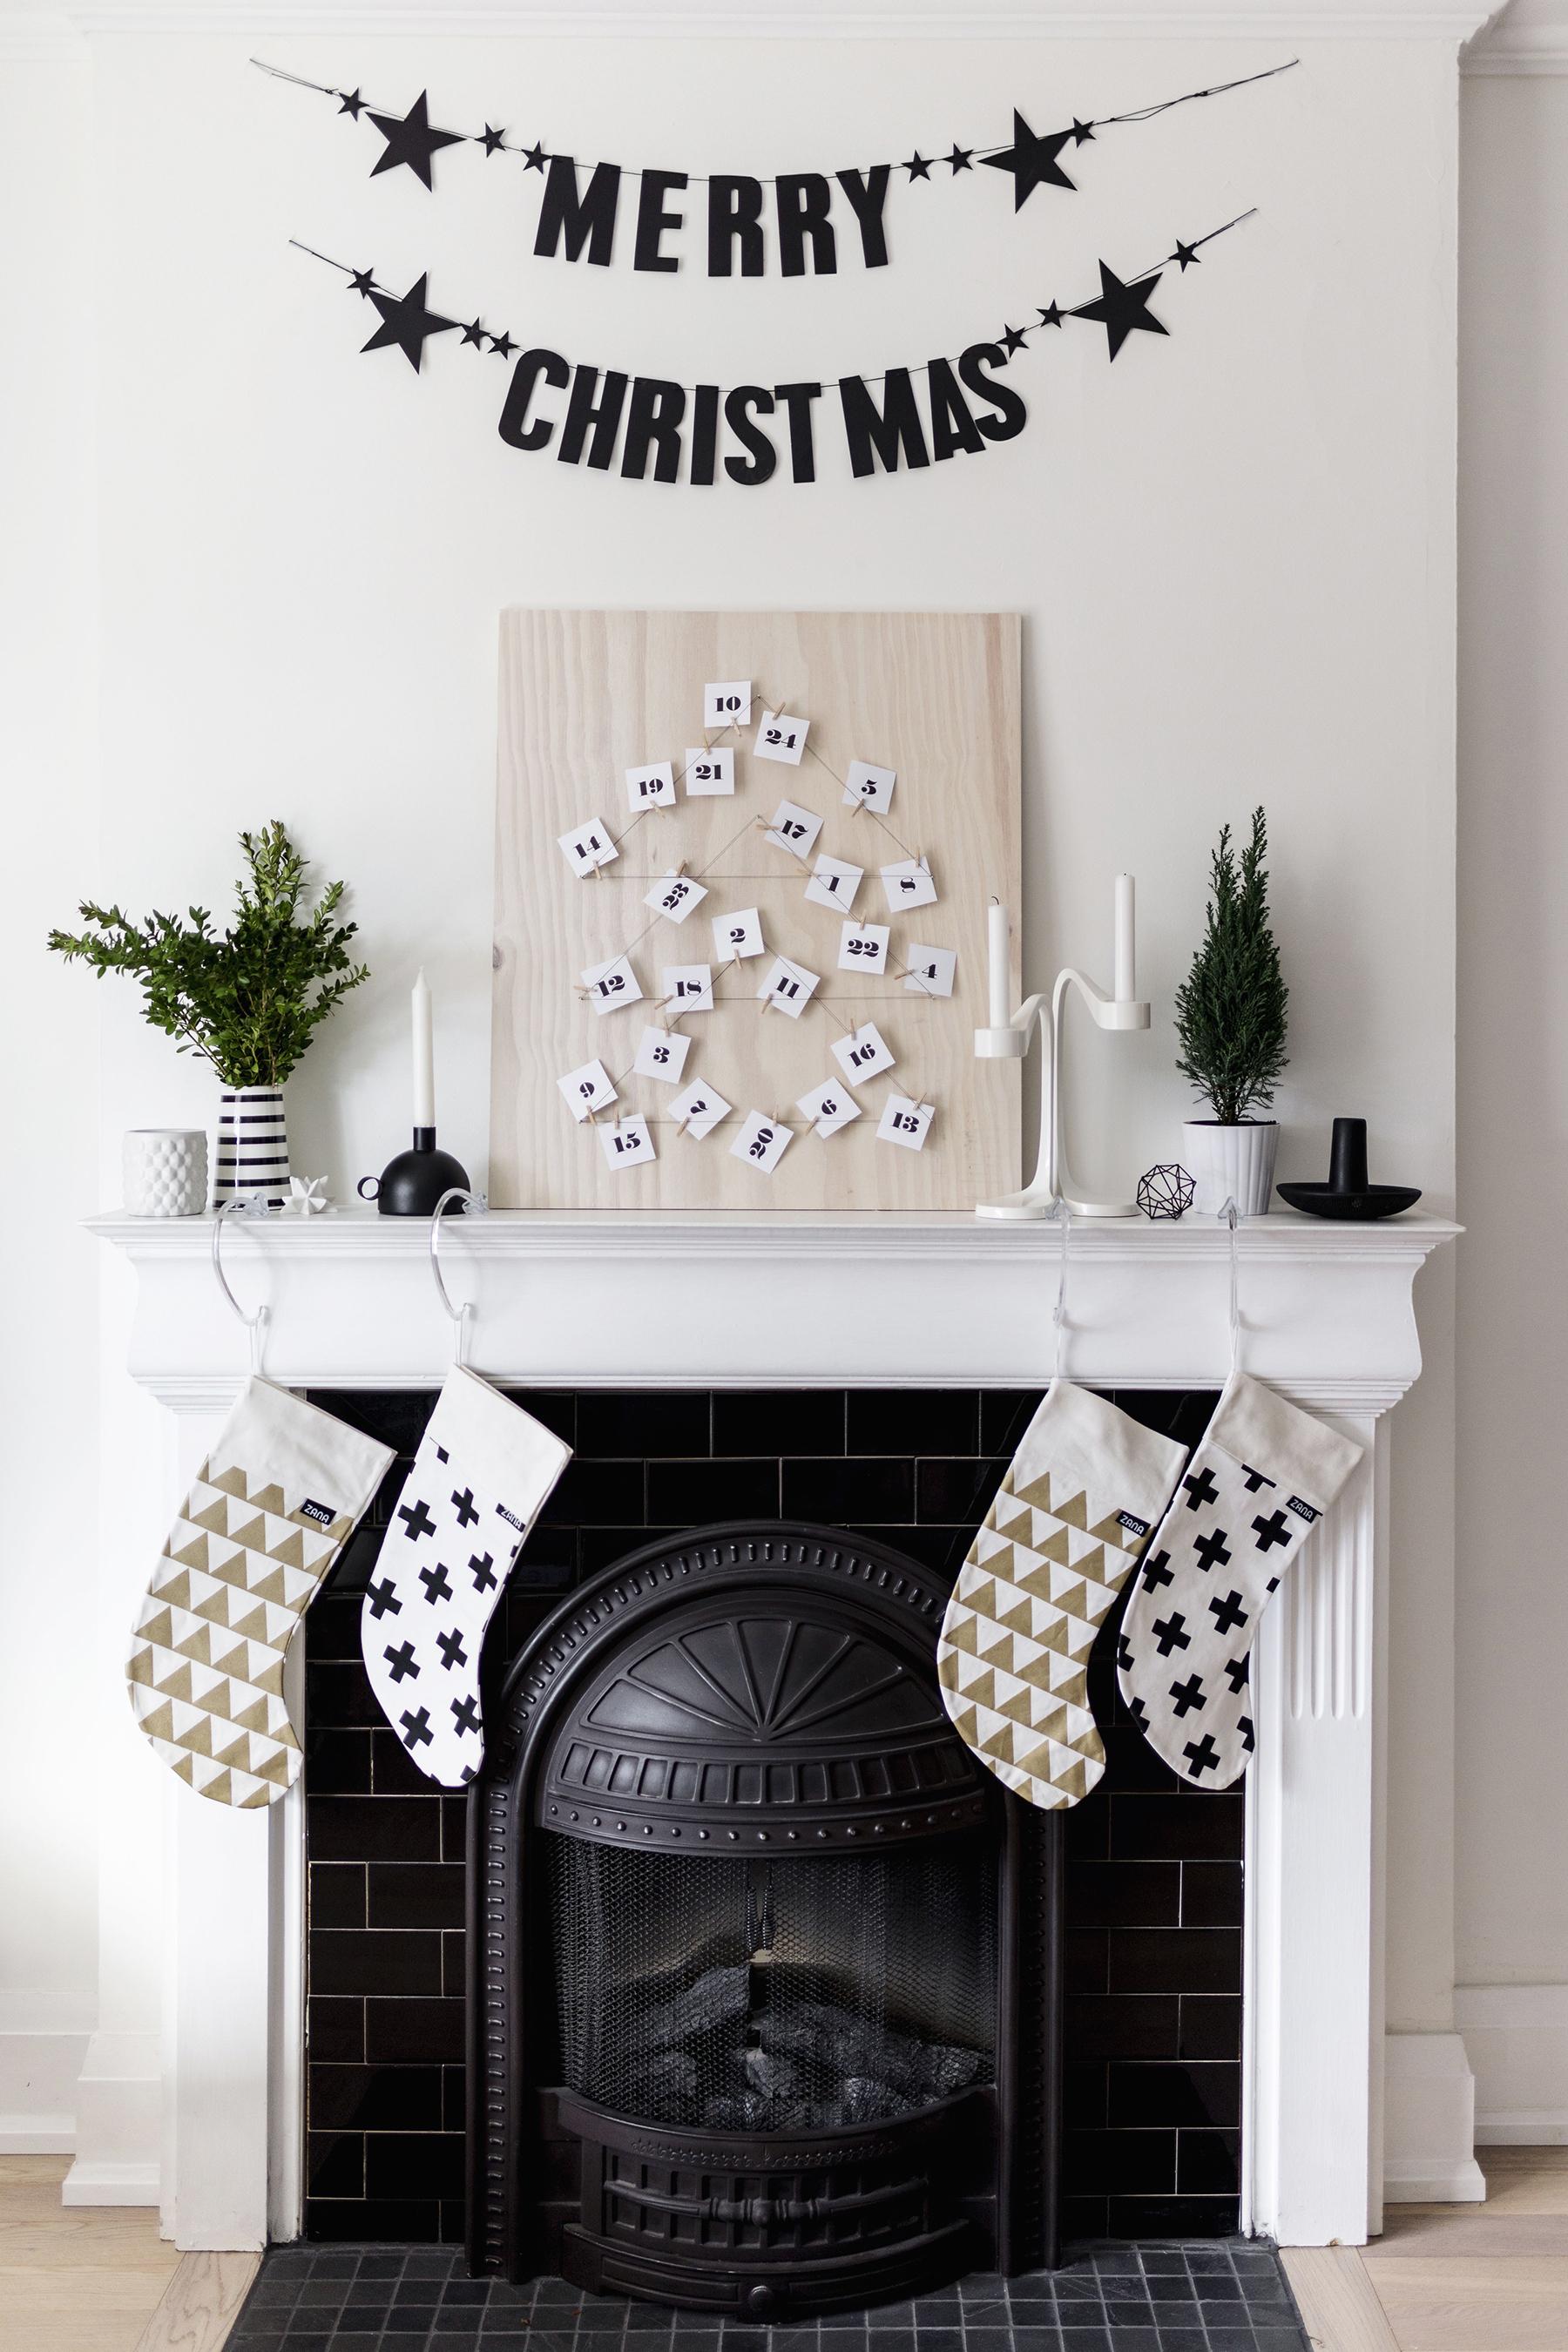 Diy Modern, Scandinavian Advent Calendar With Free Printable | Happy regarding Free Printable Blank Advent Activities List Minimal